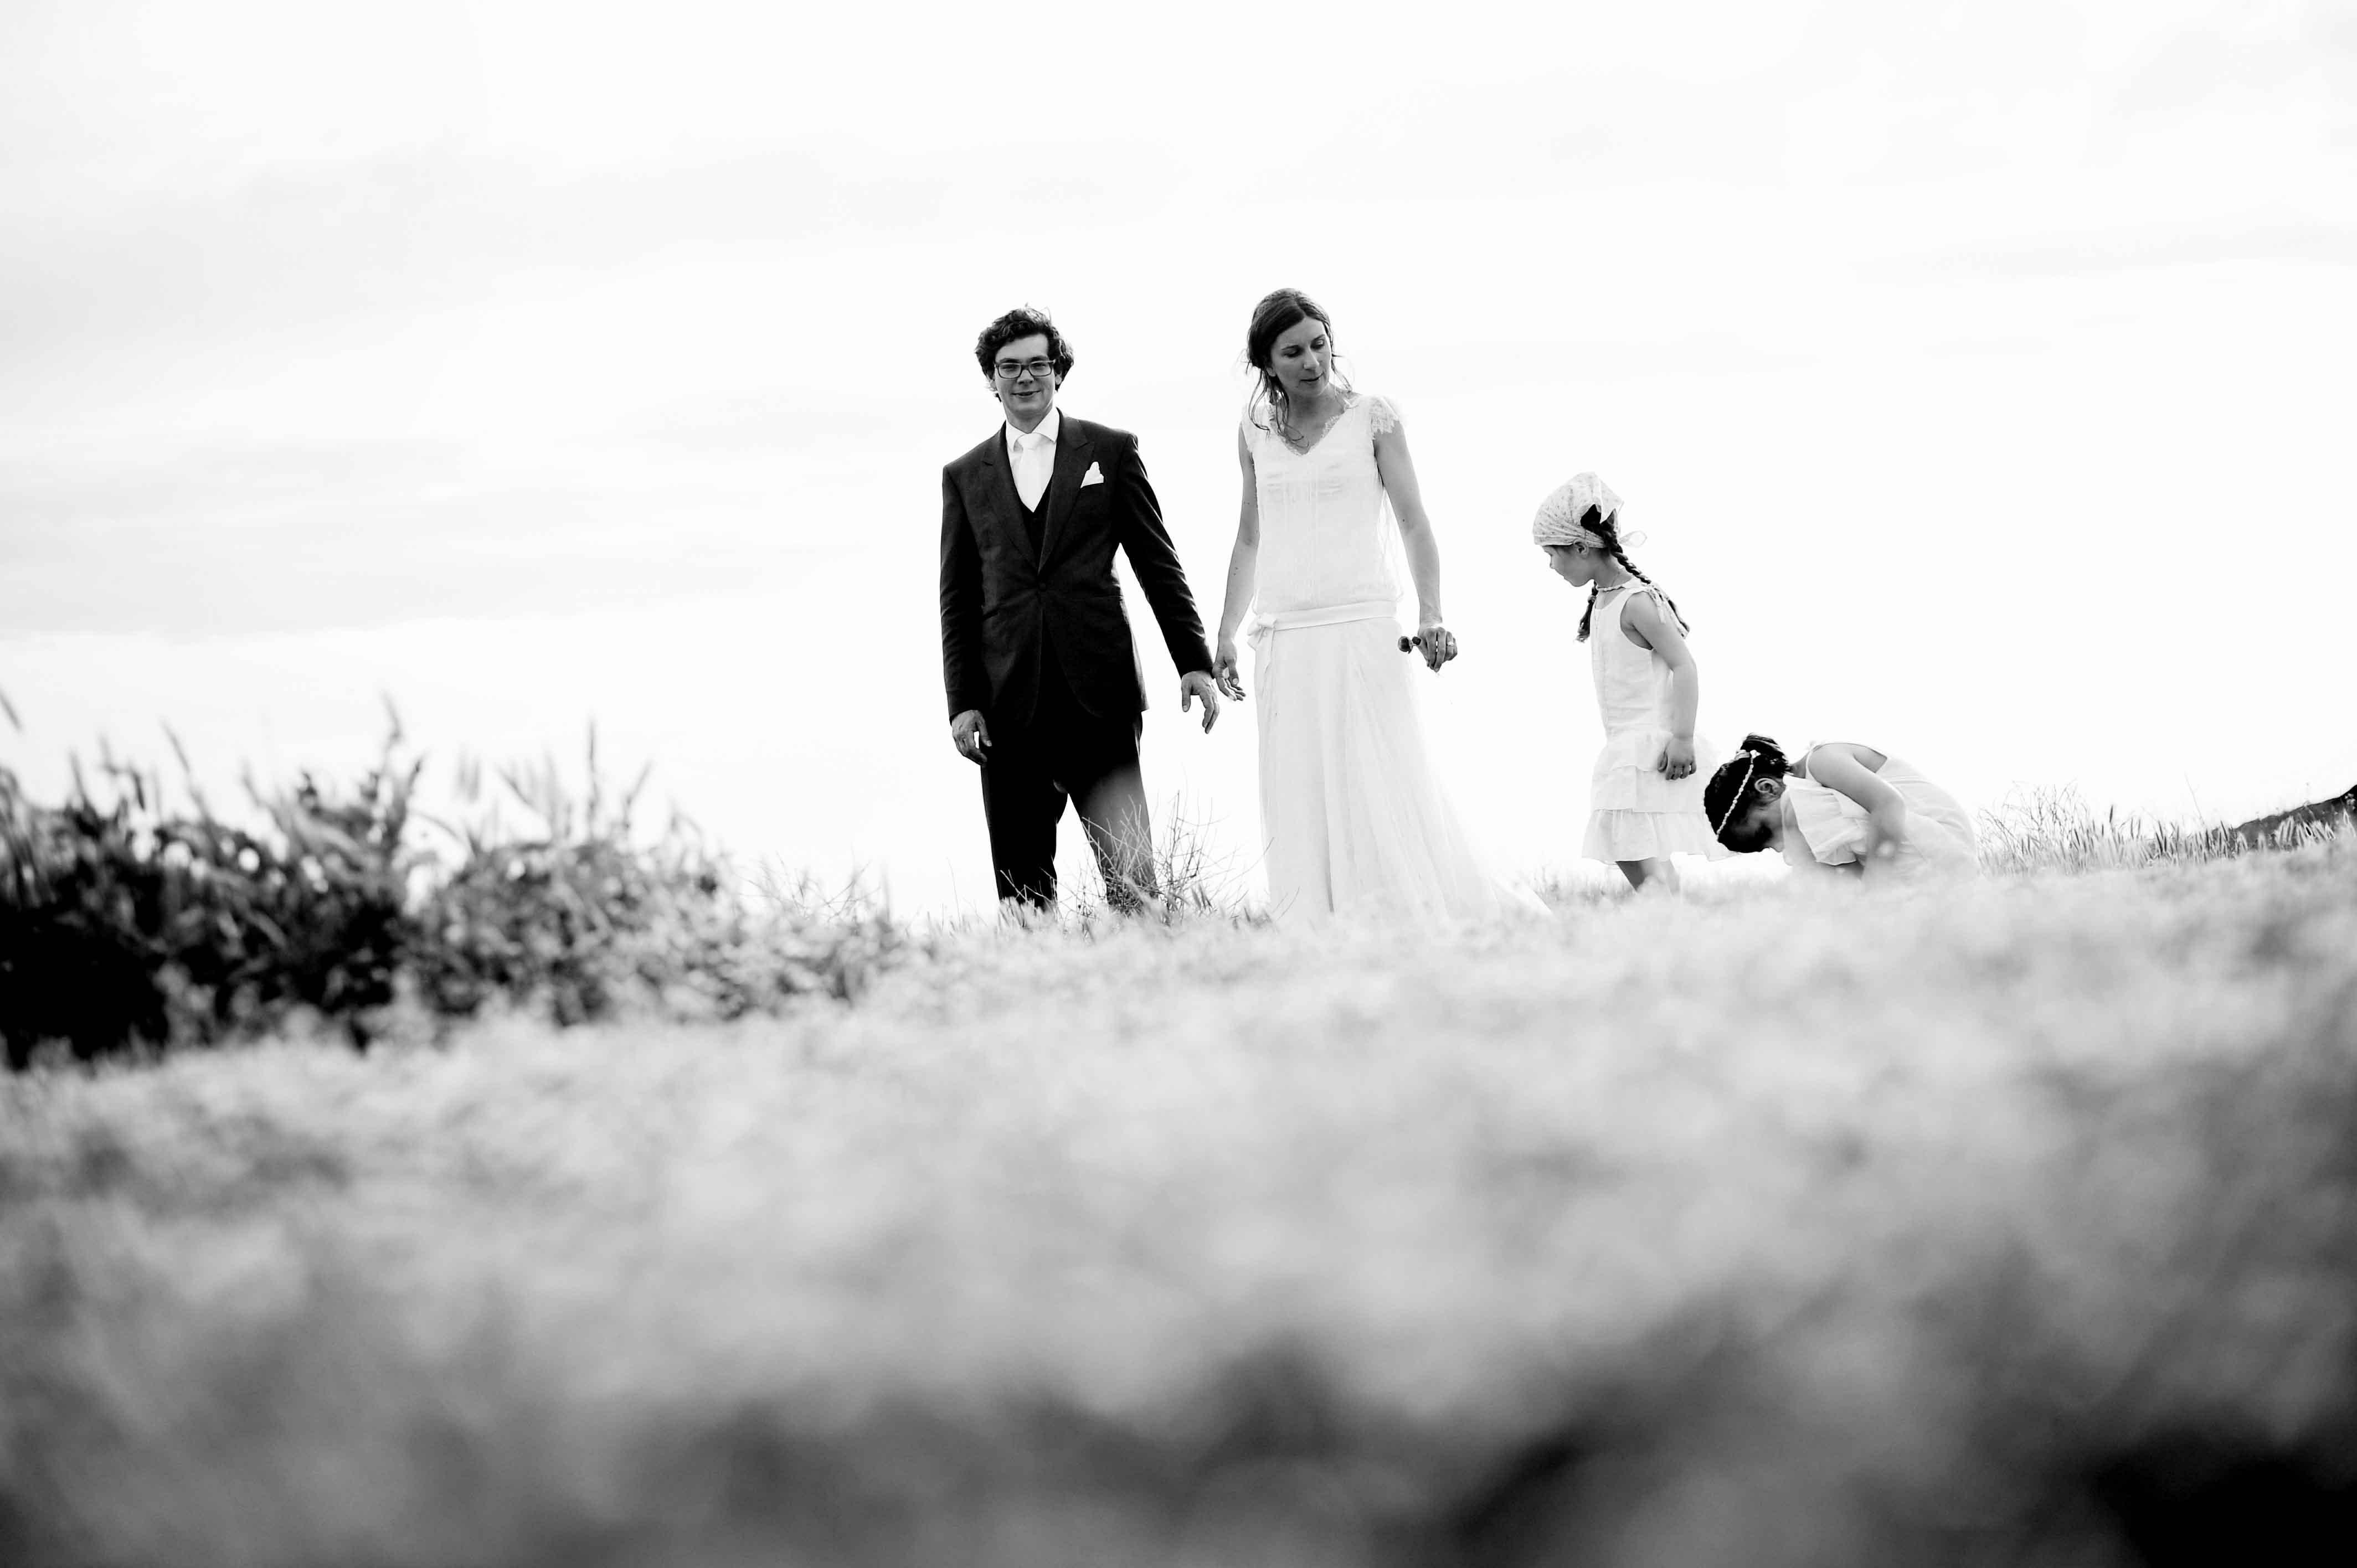 photographe mariage corse (14 sur 14)